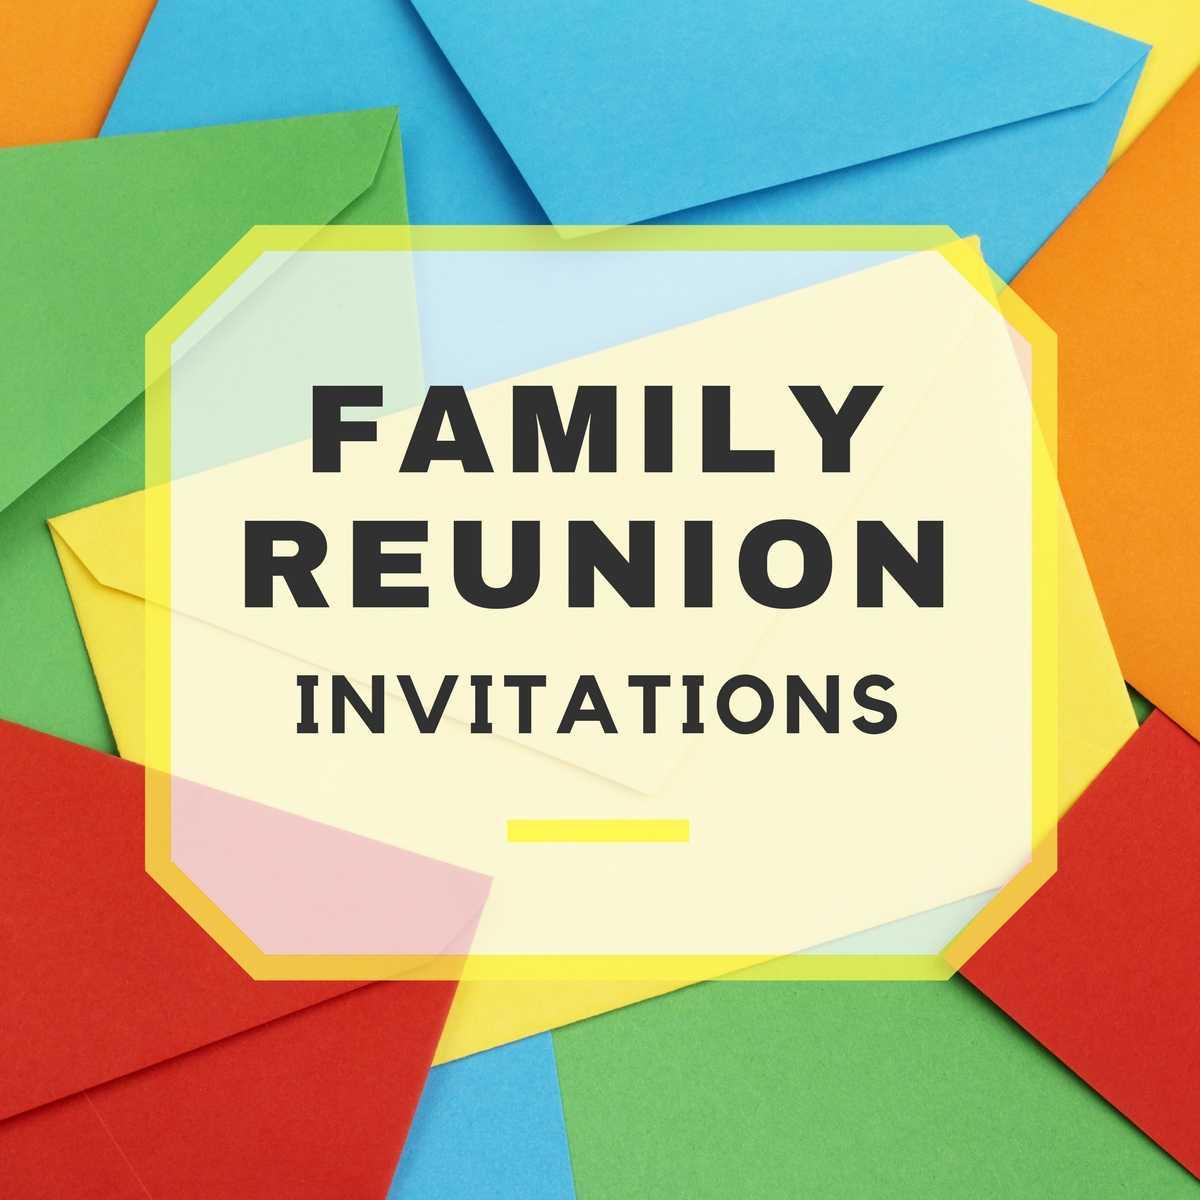 Family Reunion Invitations Throughout Reunion Invitation Card Templates